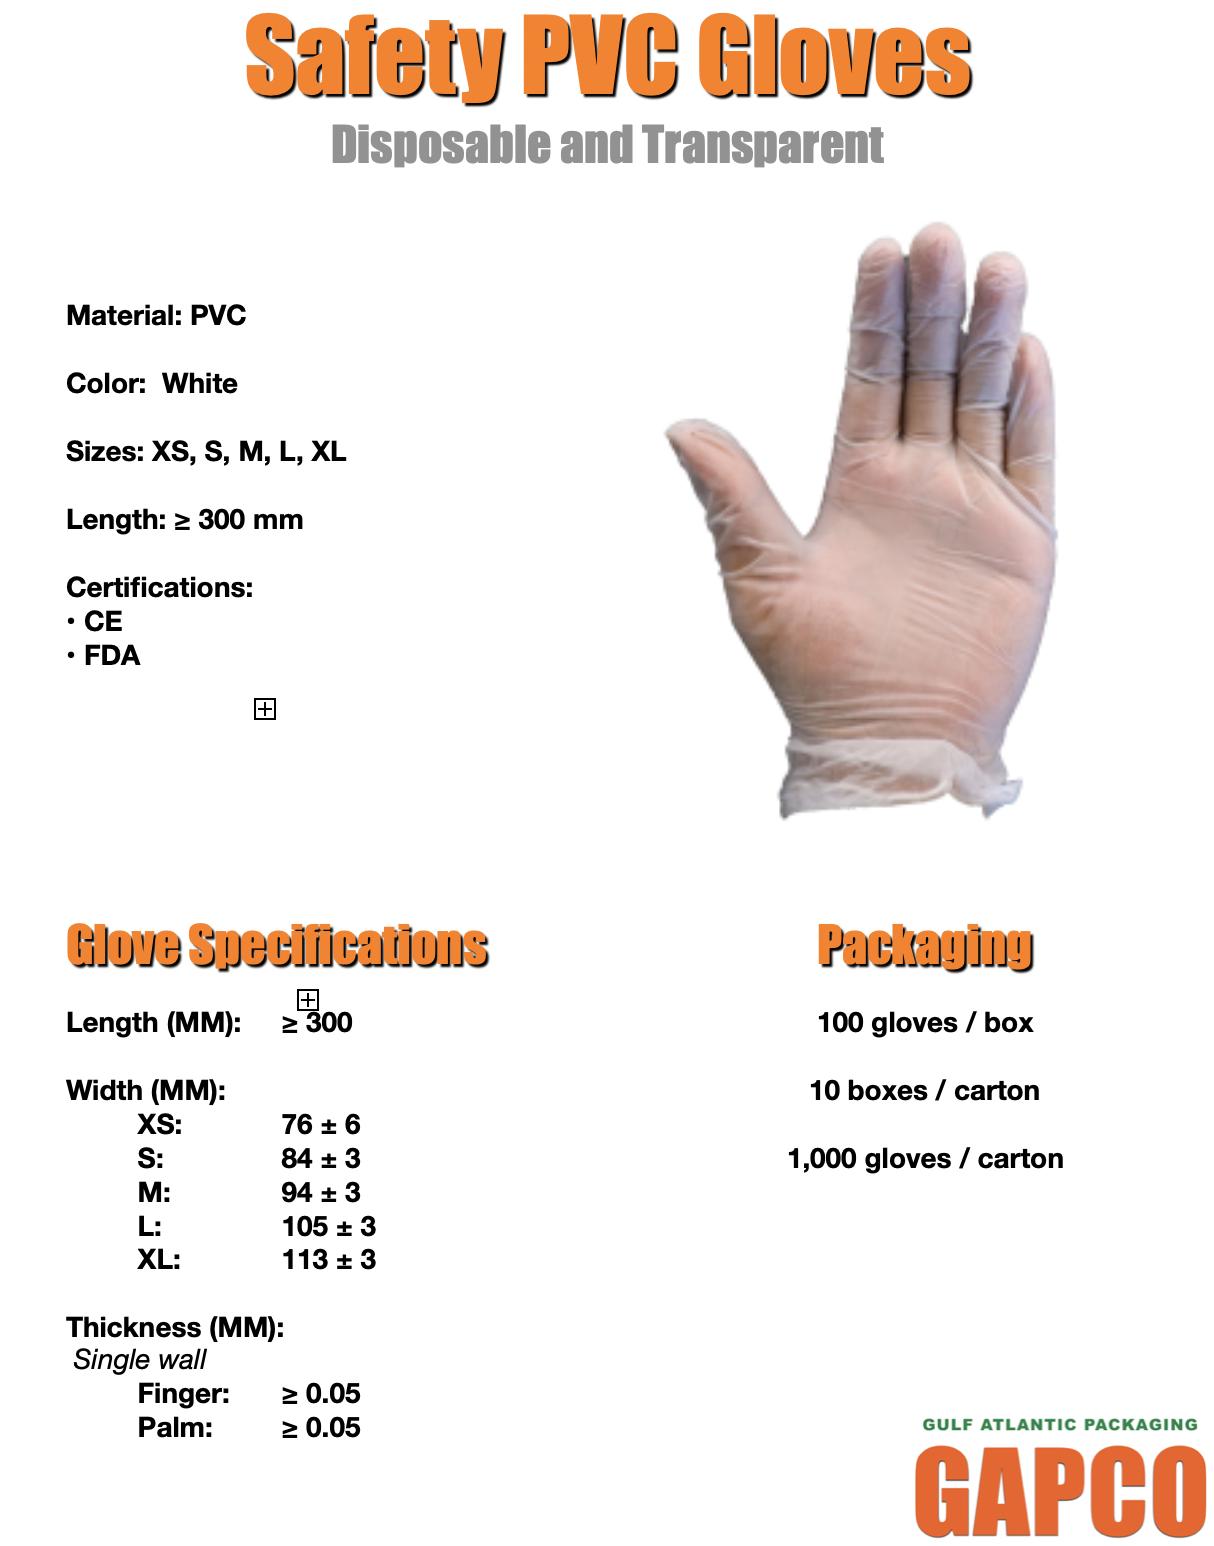 Disposable Vinyl Gloves  - Literature